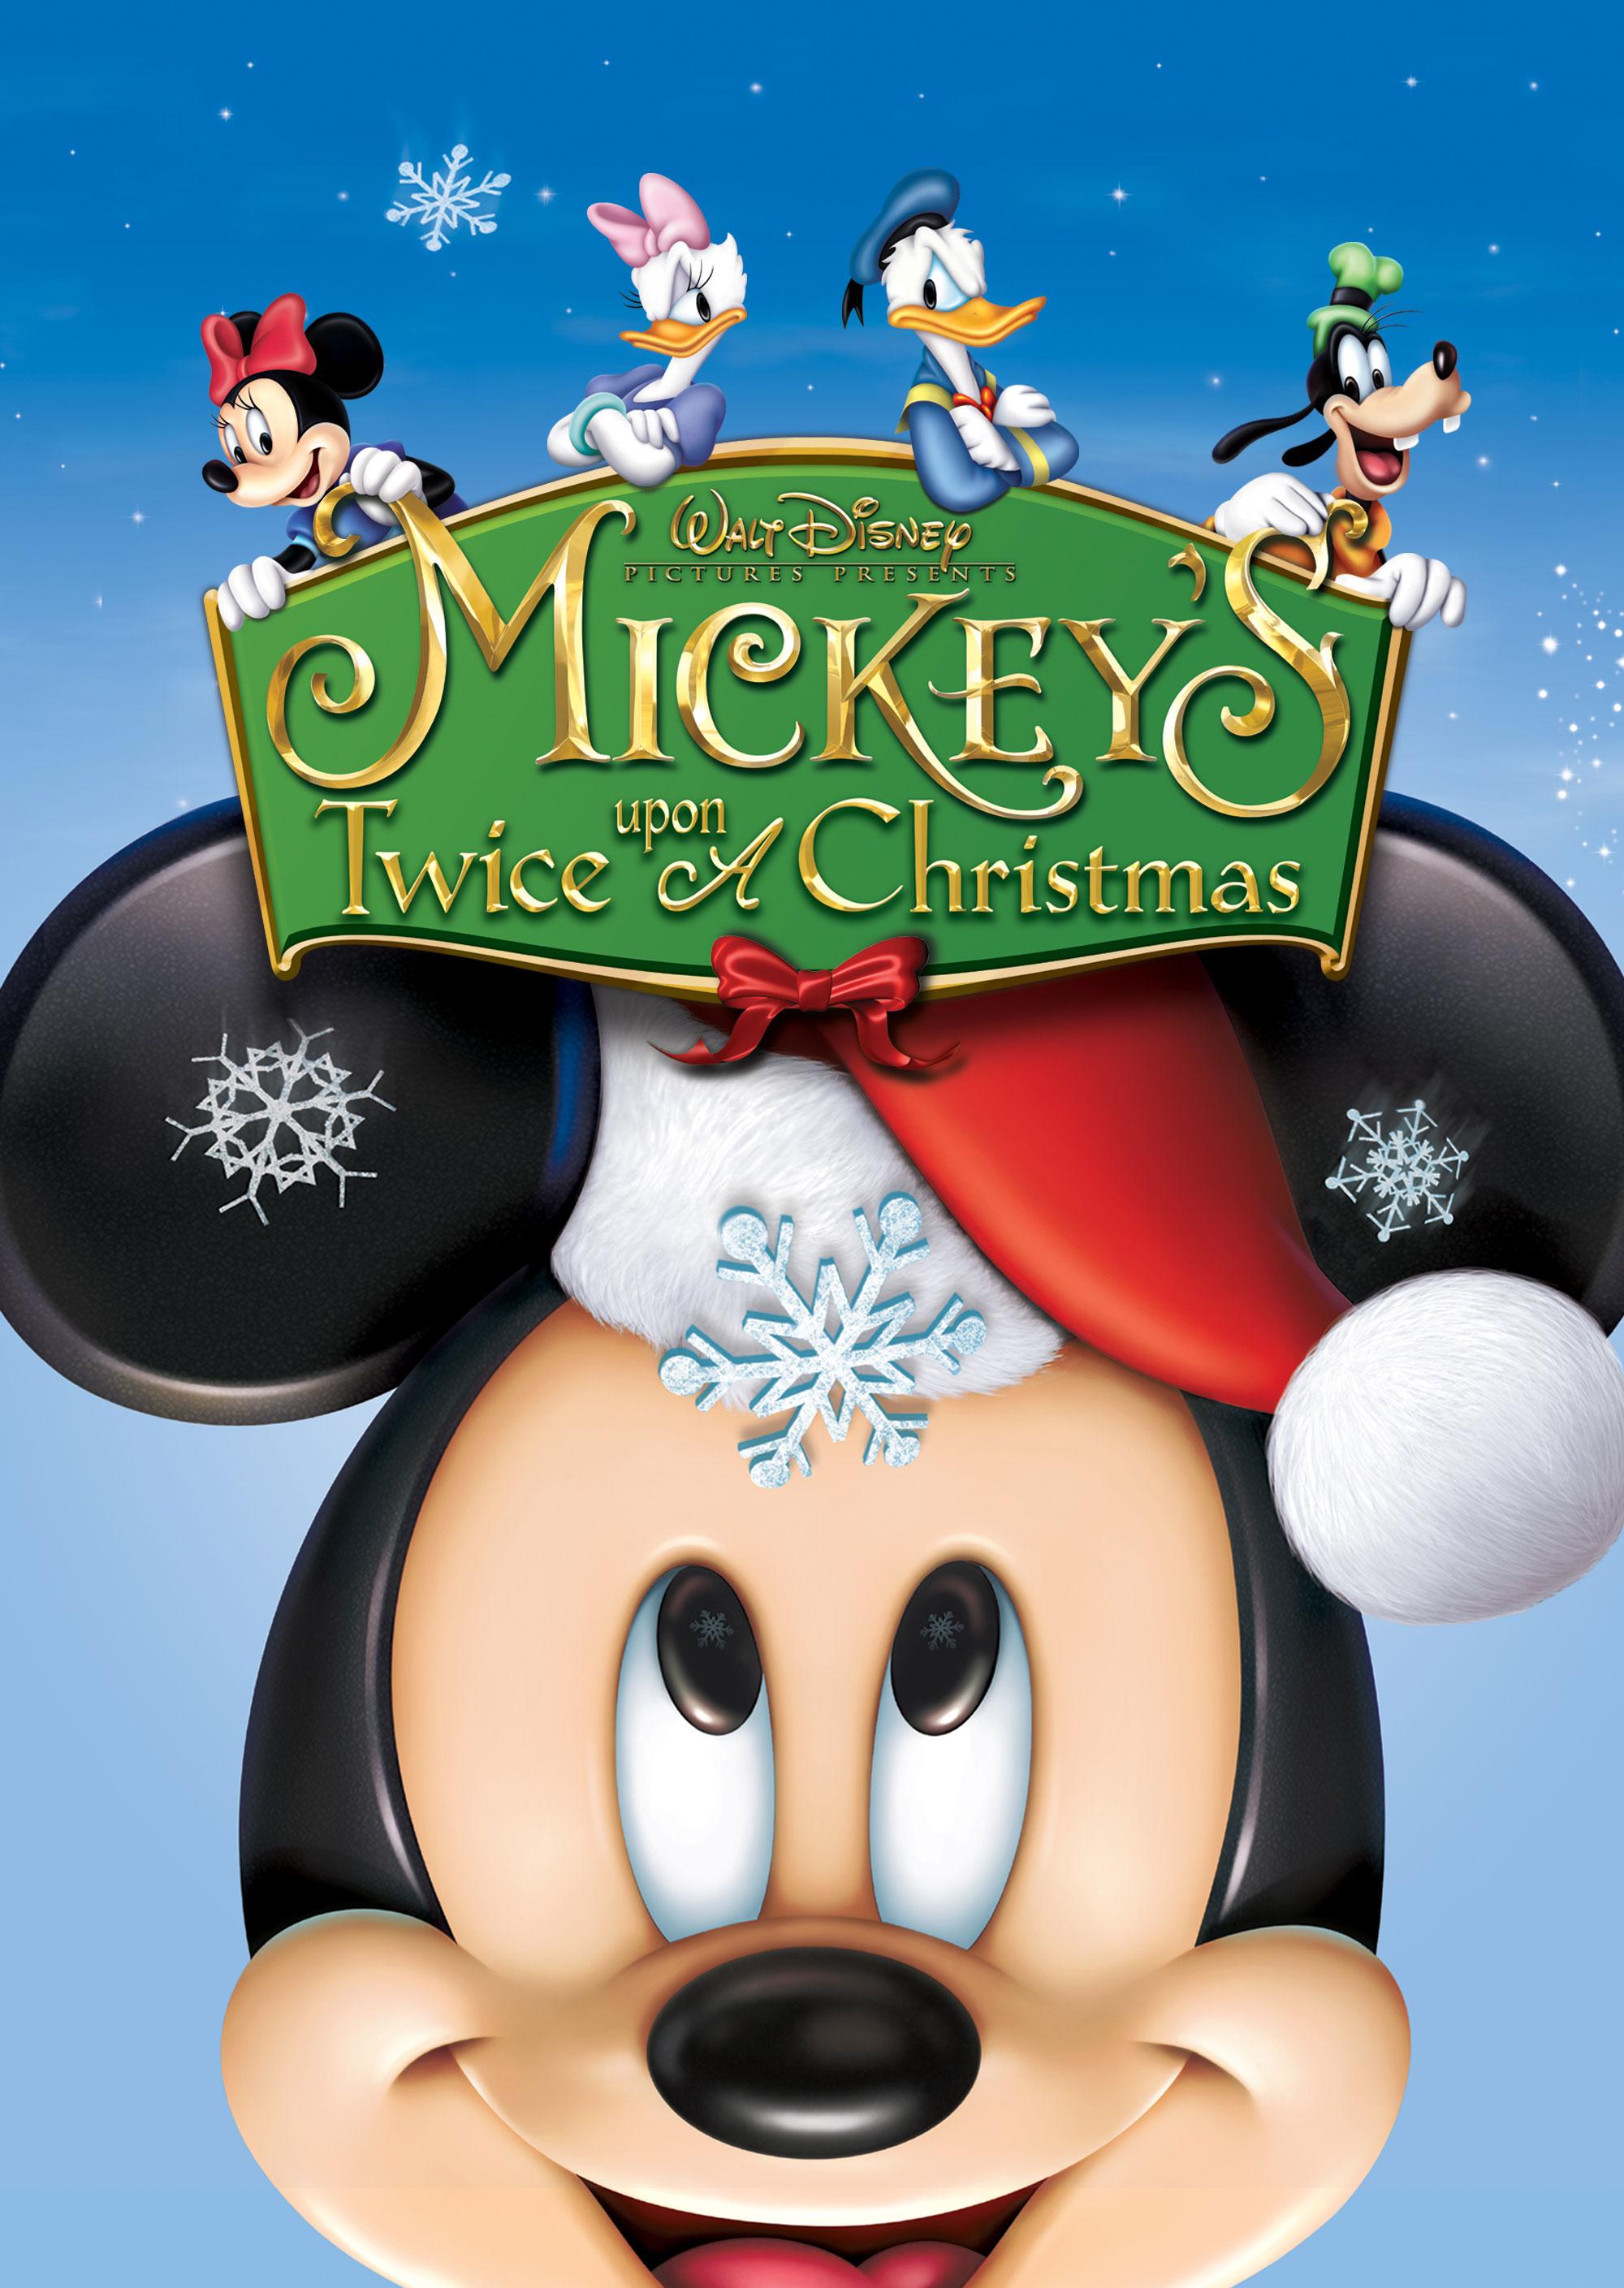 Mickey's Twice Upon a Christmas | Japanese Anime Wiki | FANDOM ...